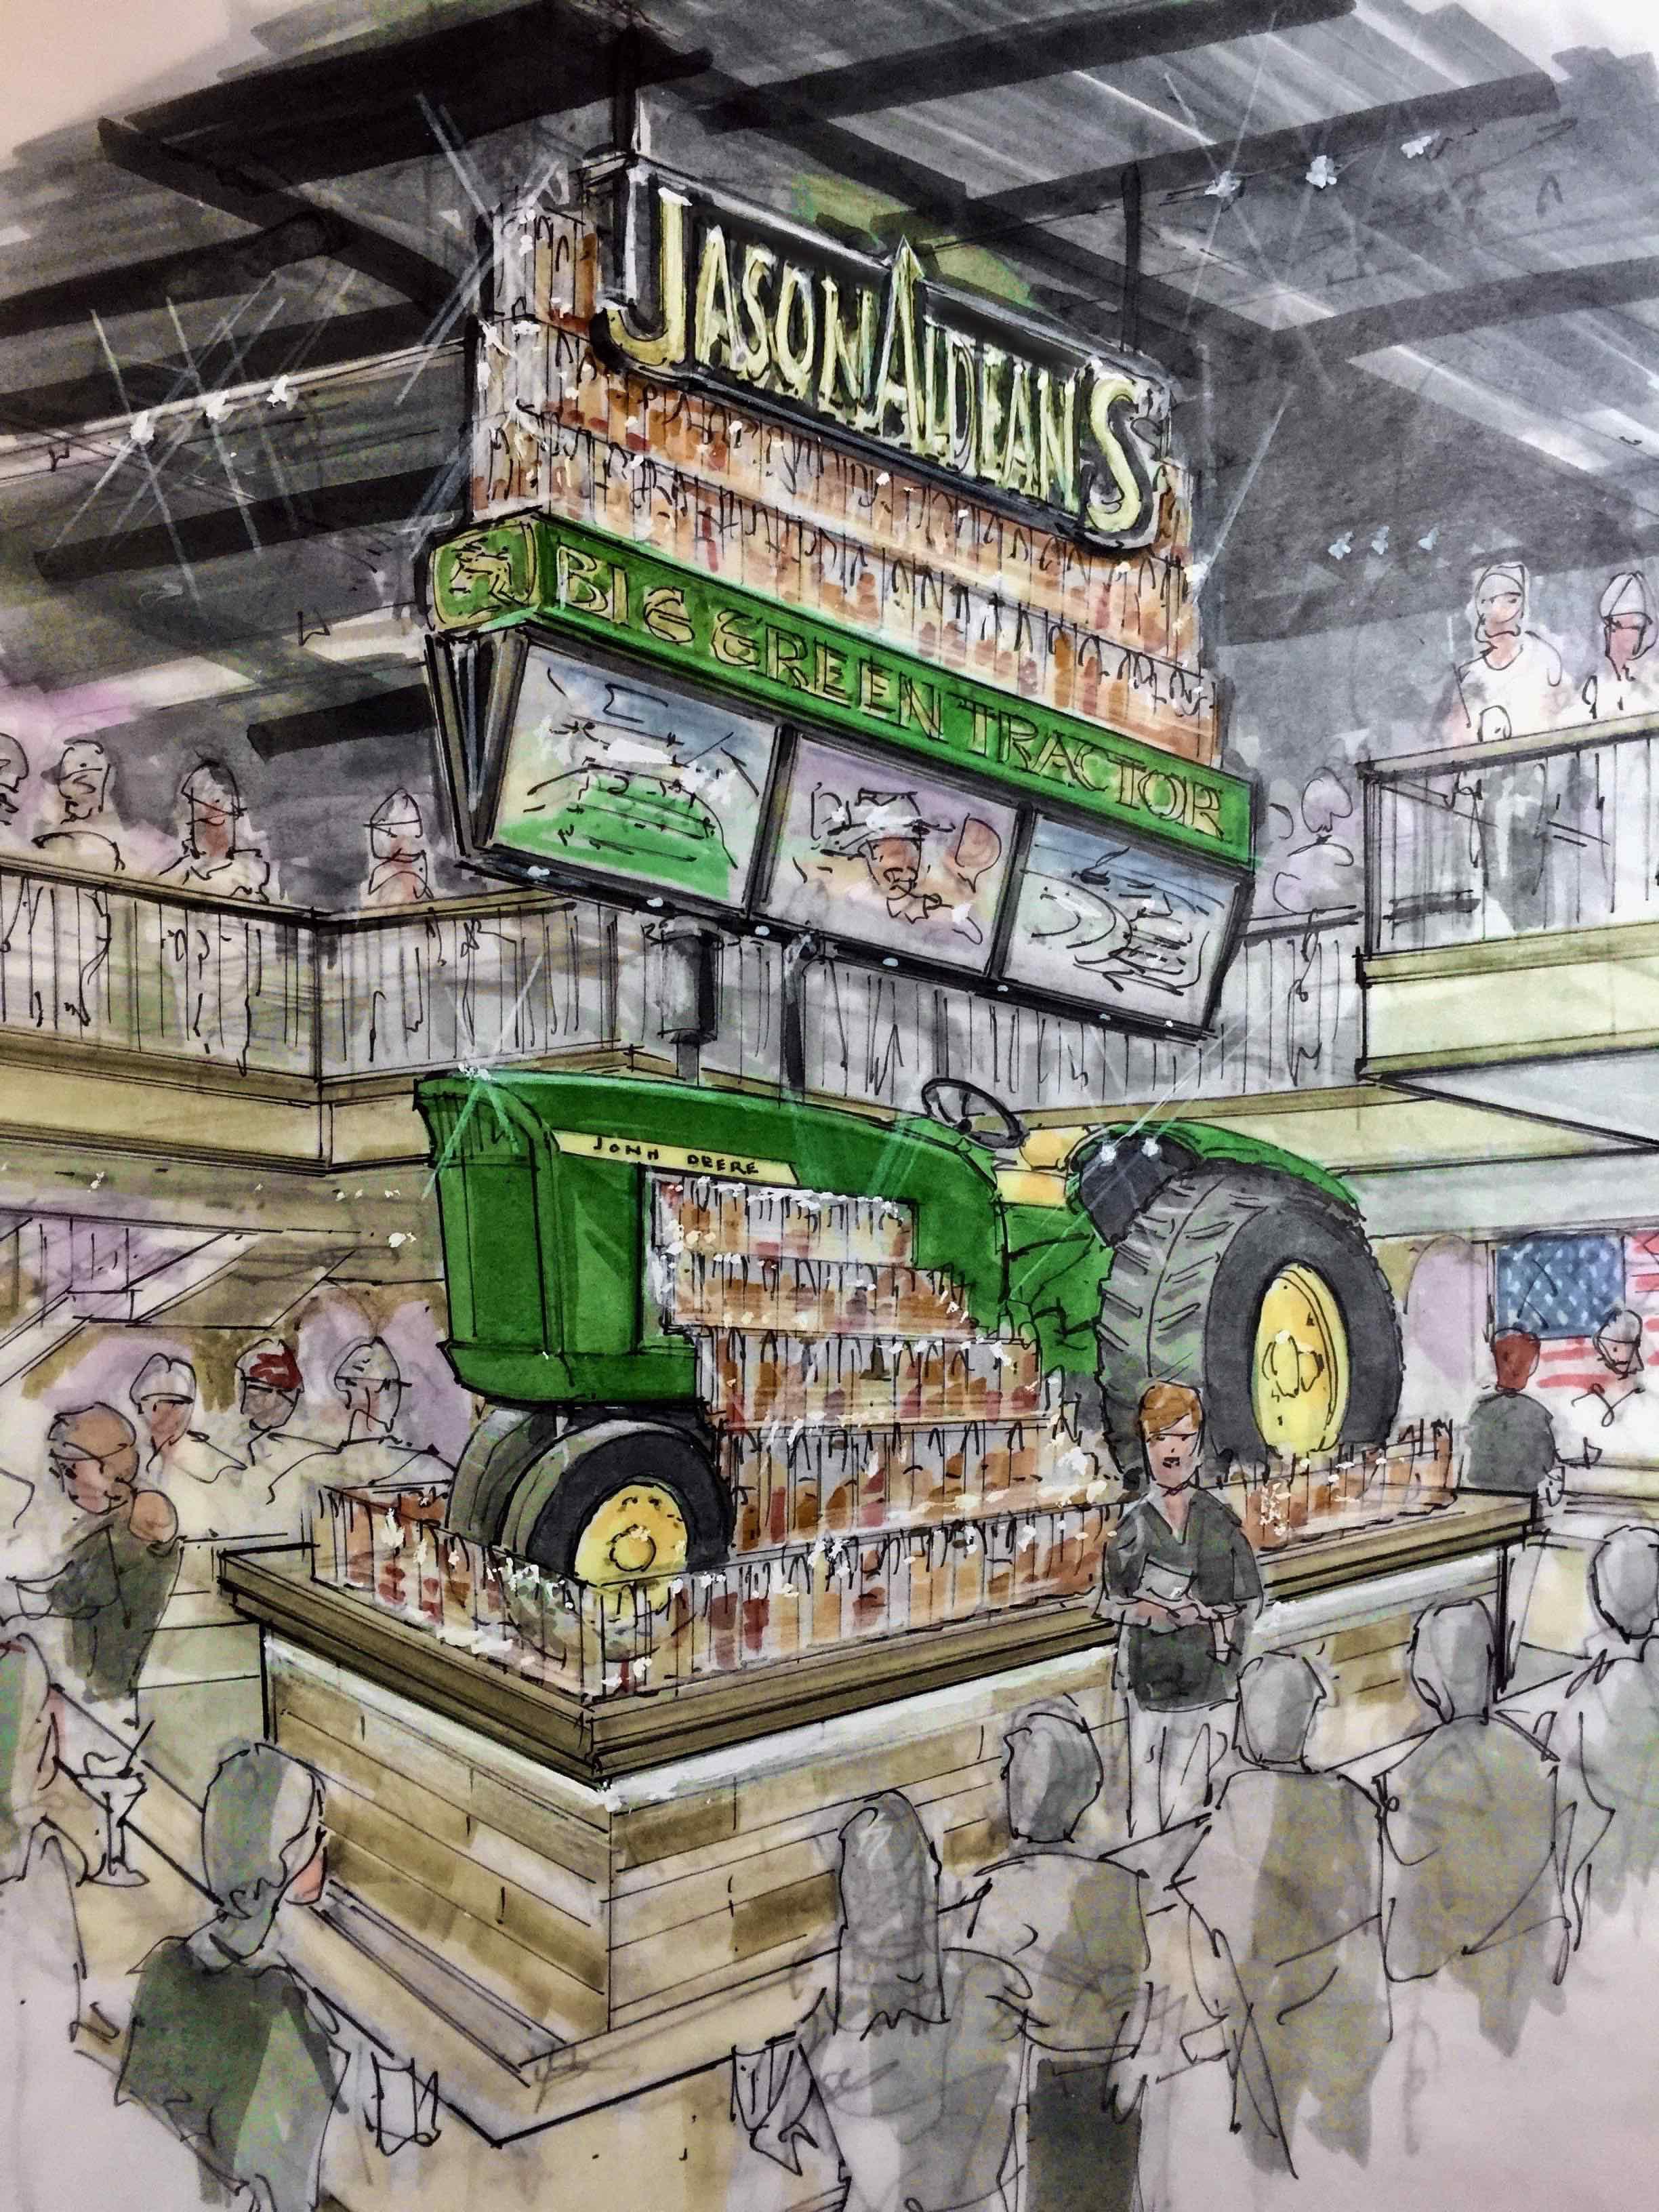 Jason Aldeans Tractor Render